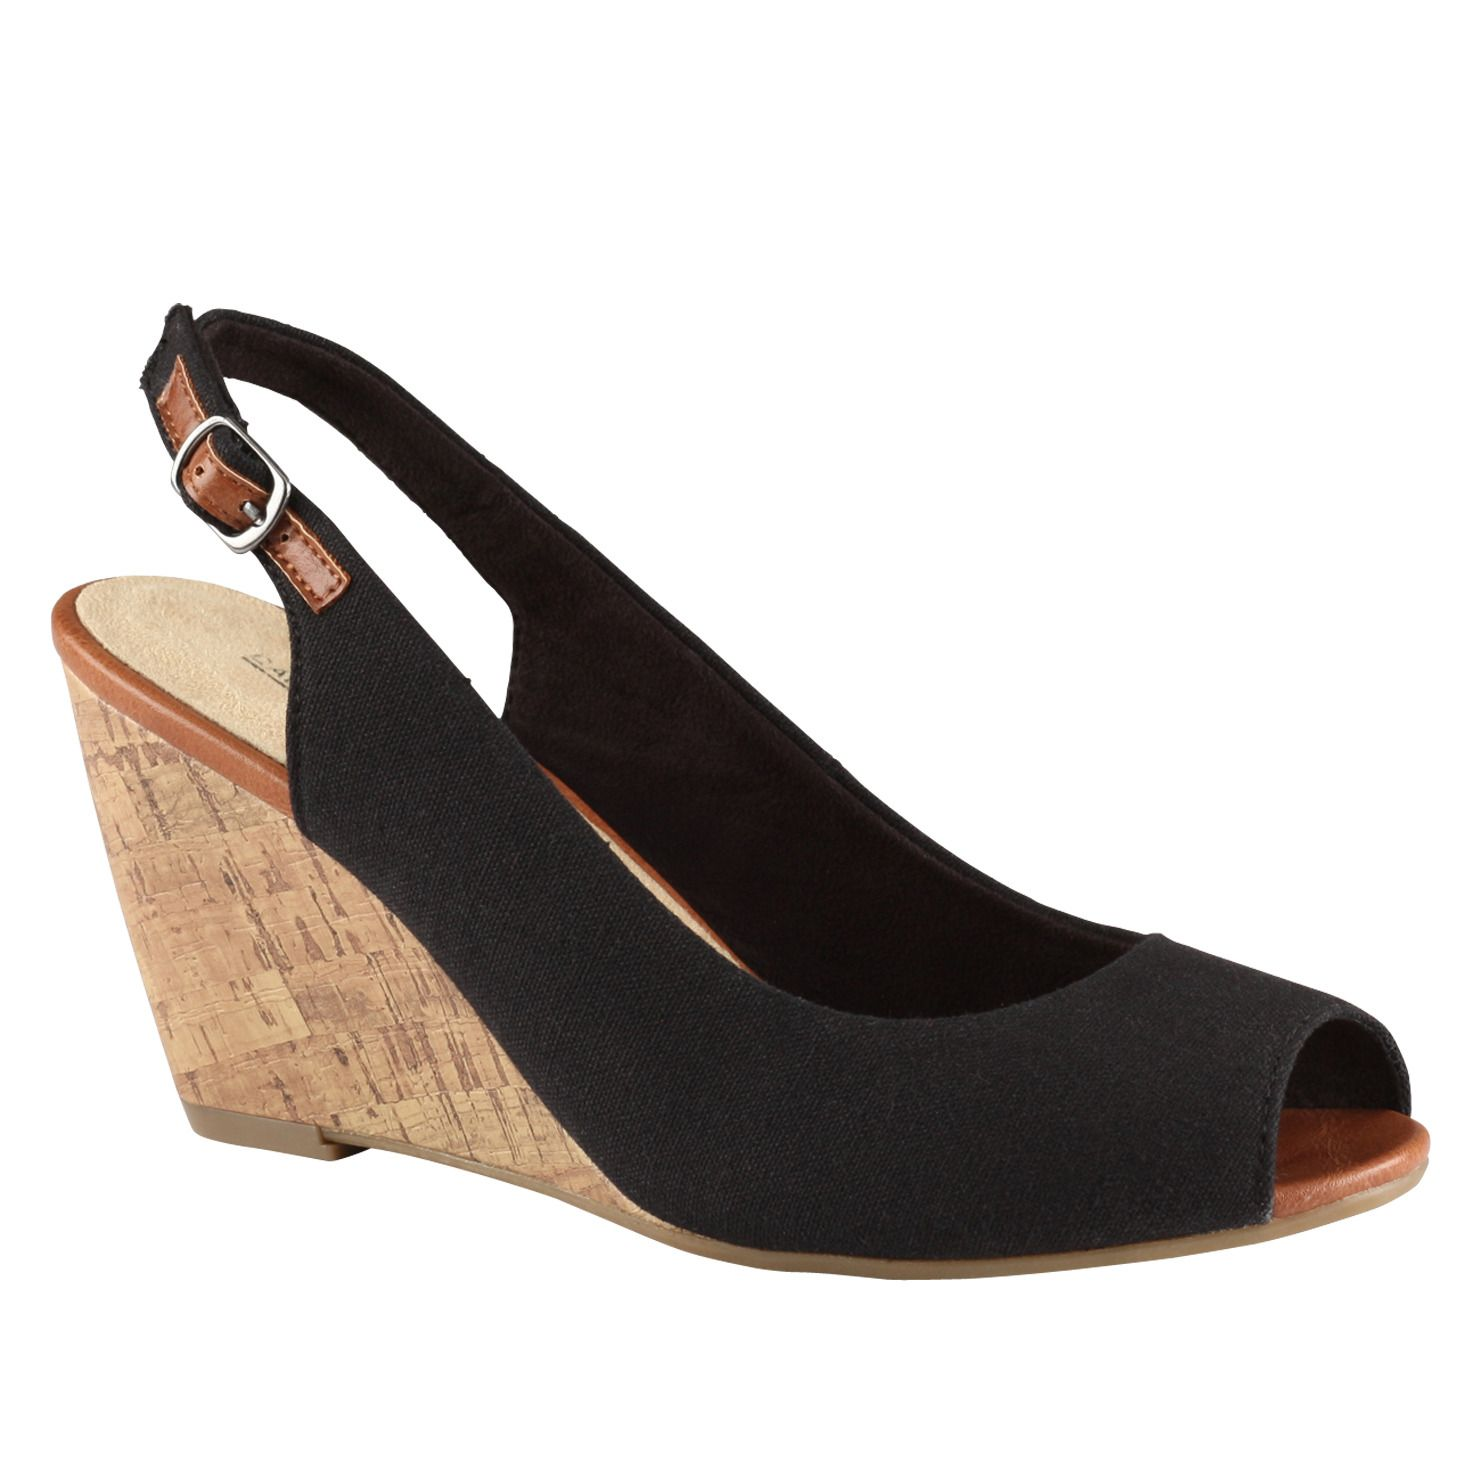 Vegan shoes, Womens sandals wedges